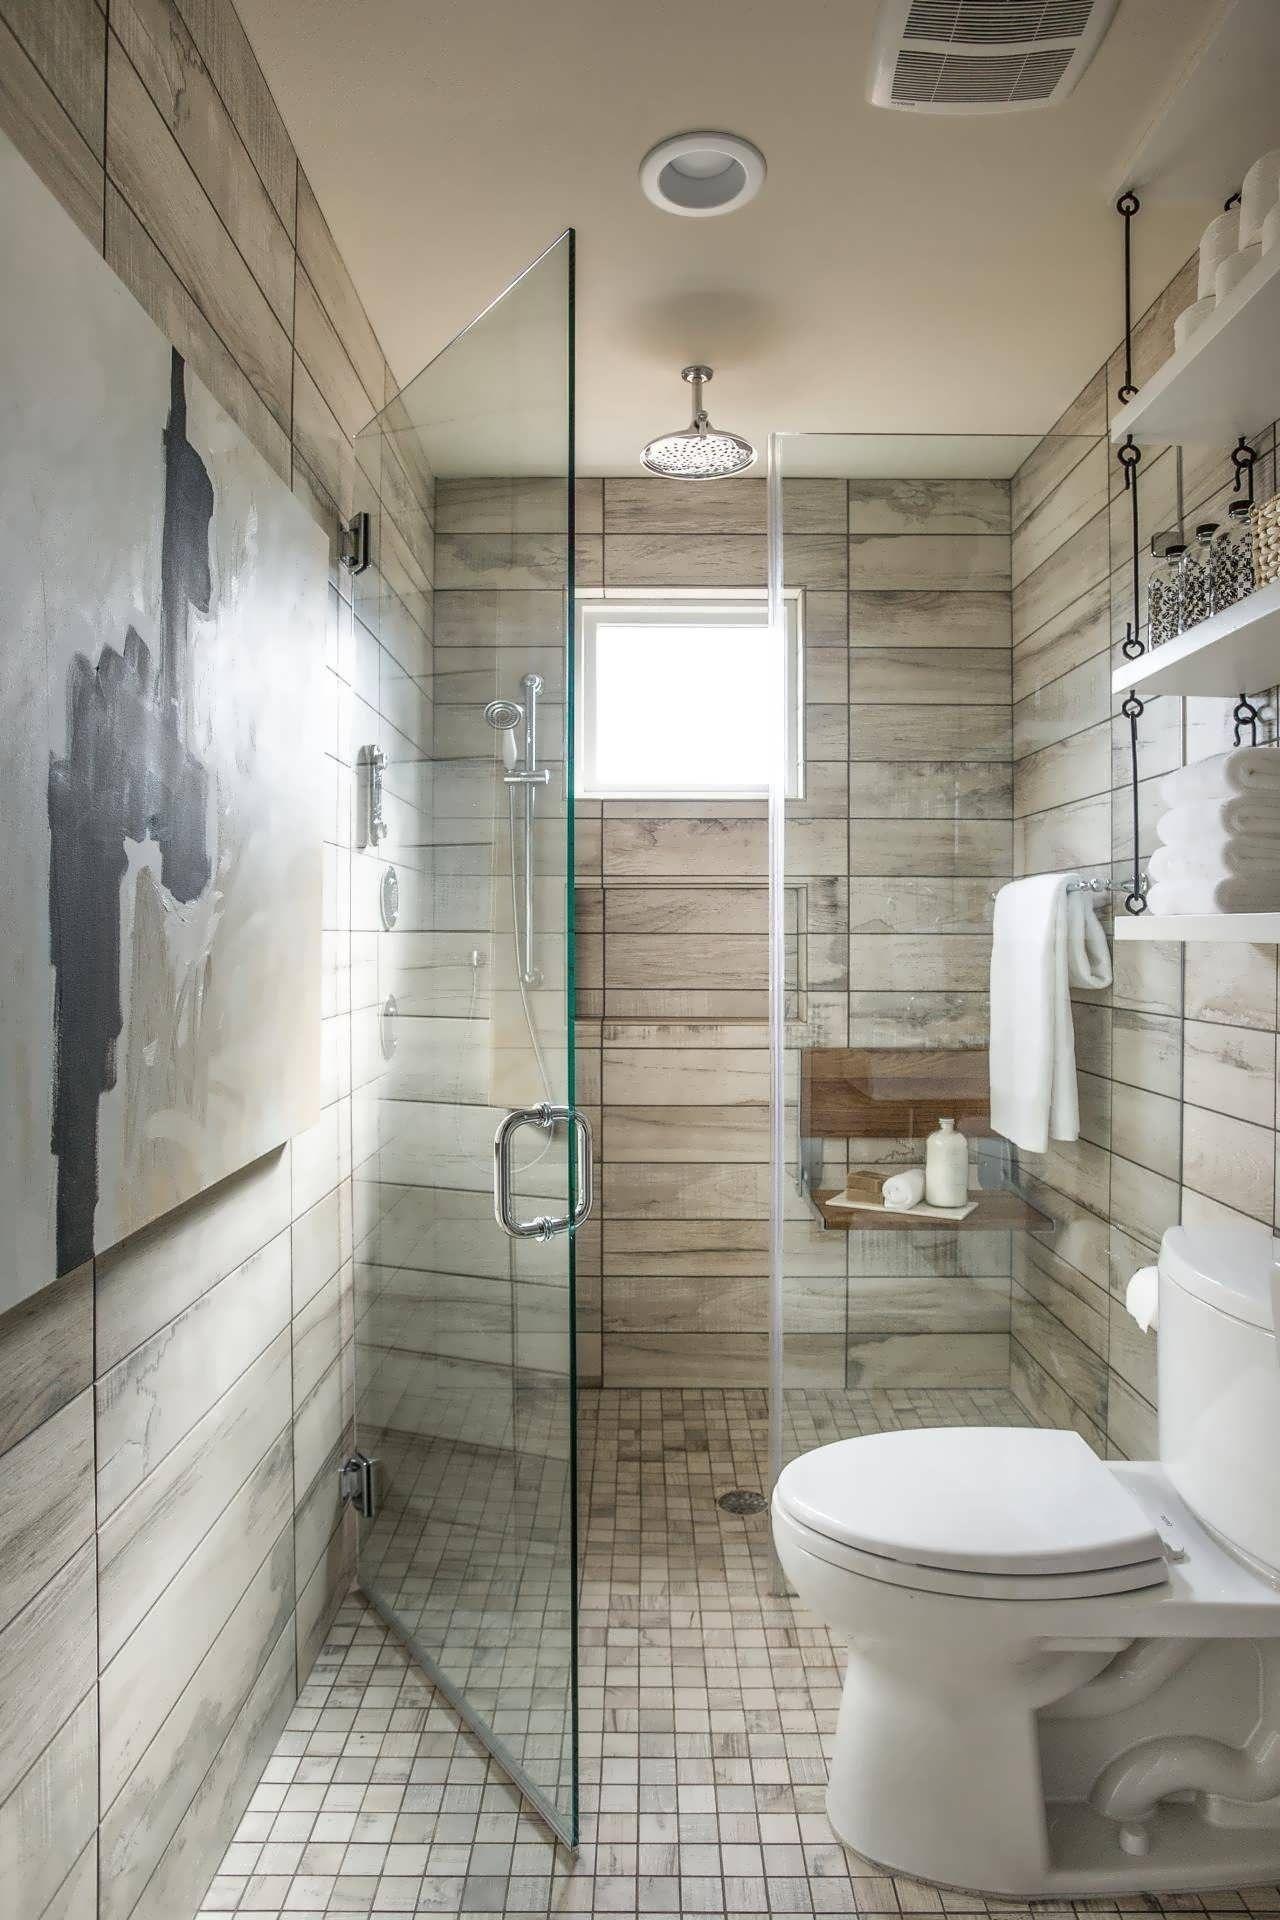 7 Nice Small Bathroom Universal Design Residential Ada Designs Ideas Modern Pinspirationaz Com